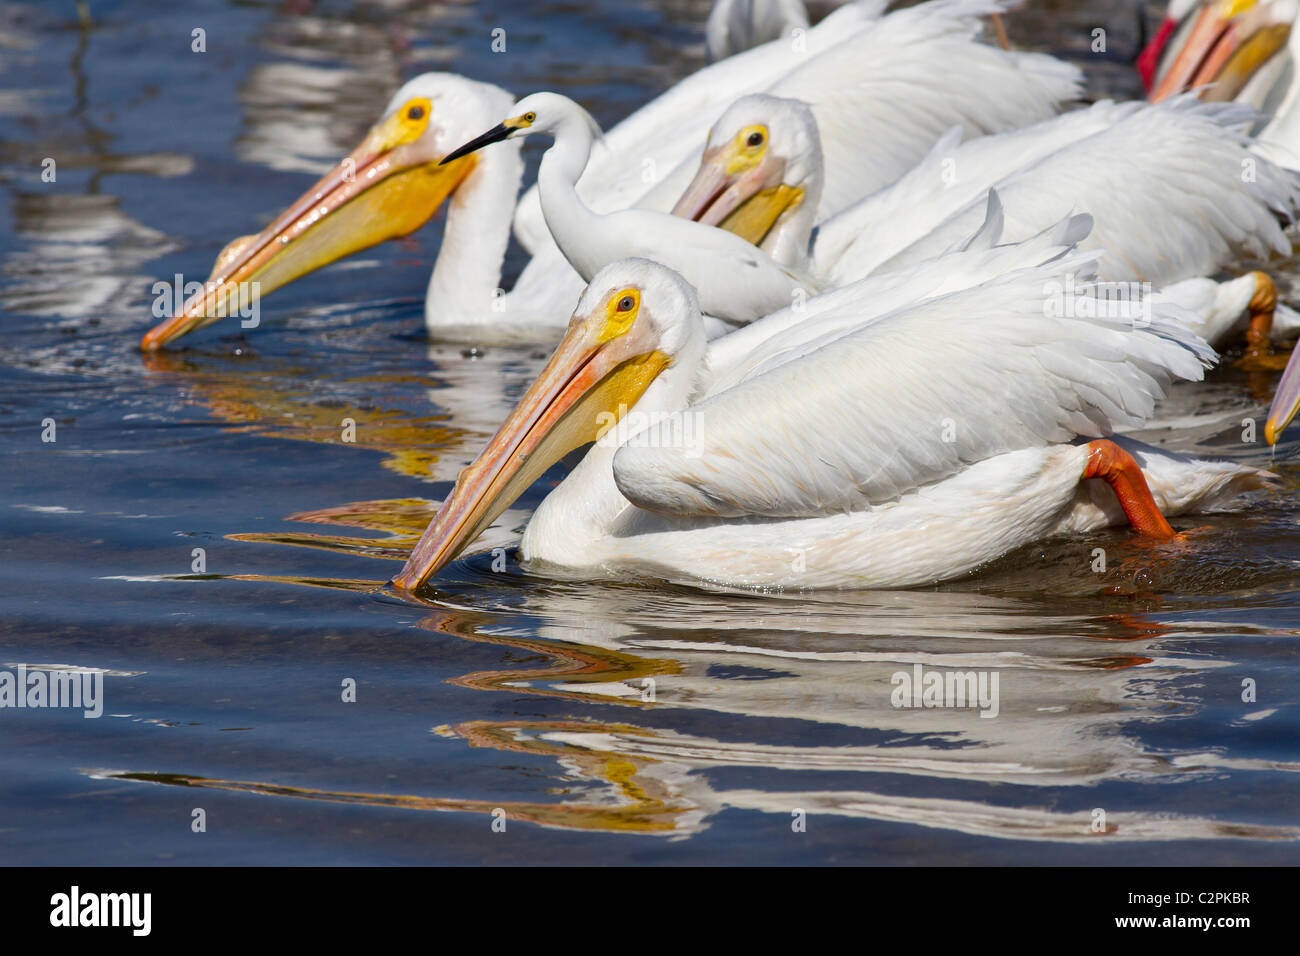 Amerikanischer weißer Pelikan, Pelicanus Erythrorhynchos, Ding Darling Wildlife Refuge, Sanibel, Florida, USA Stockbild